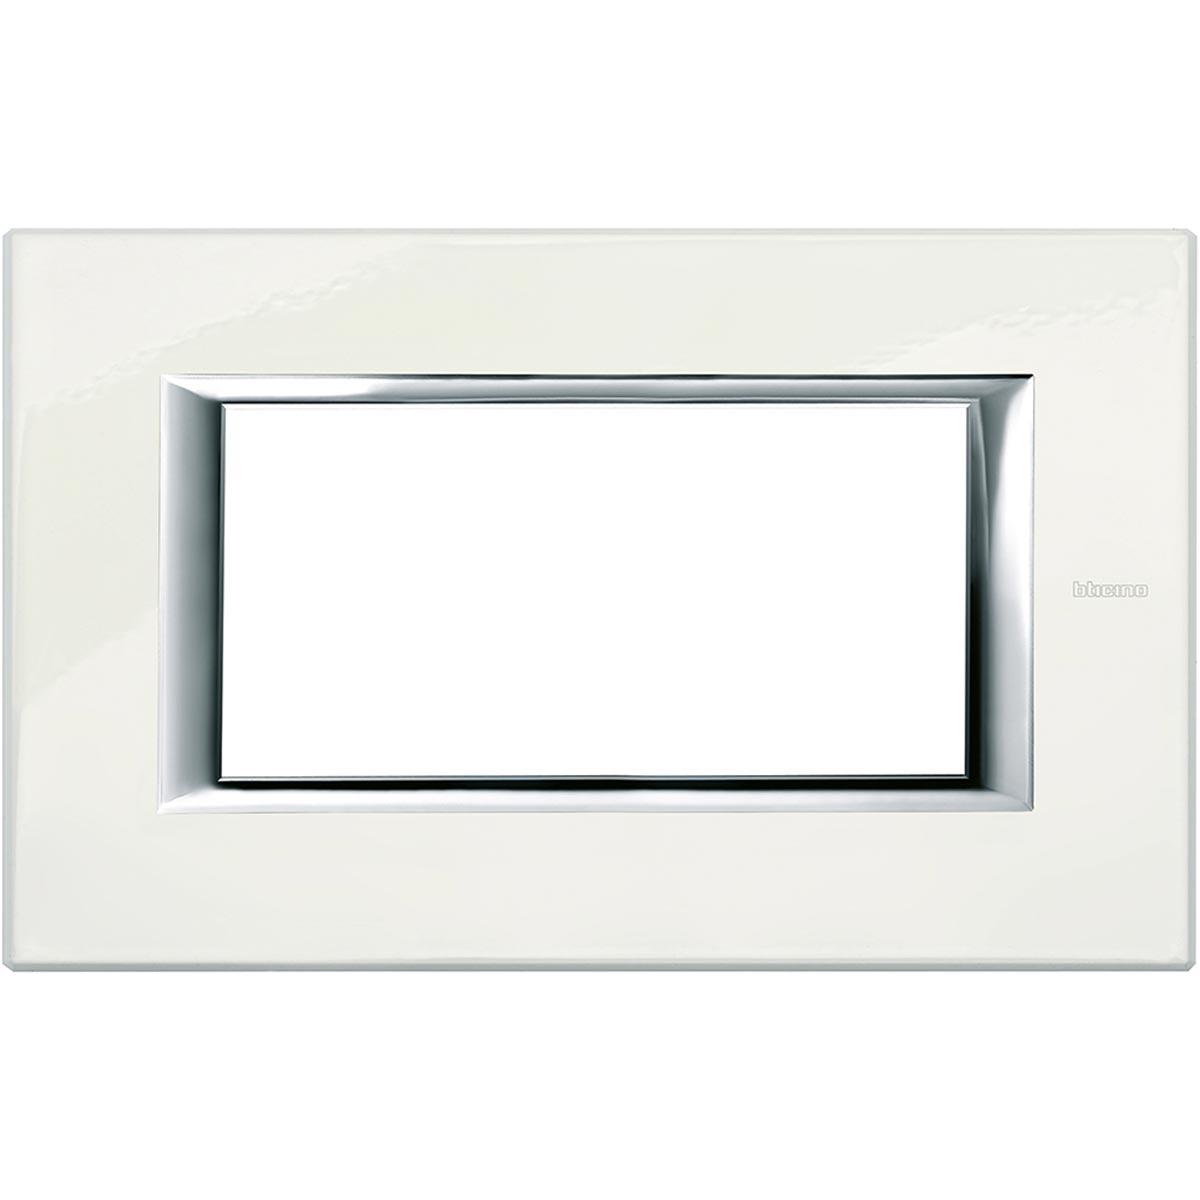 Placca 4 Posti Bticino Axolute Bianco Limoges HA4804BG